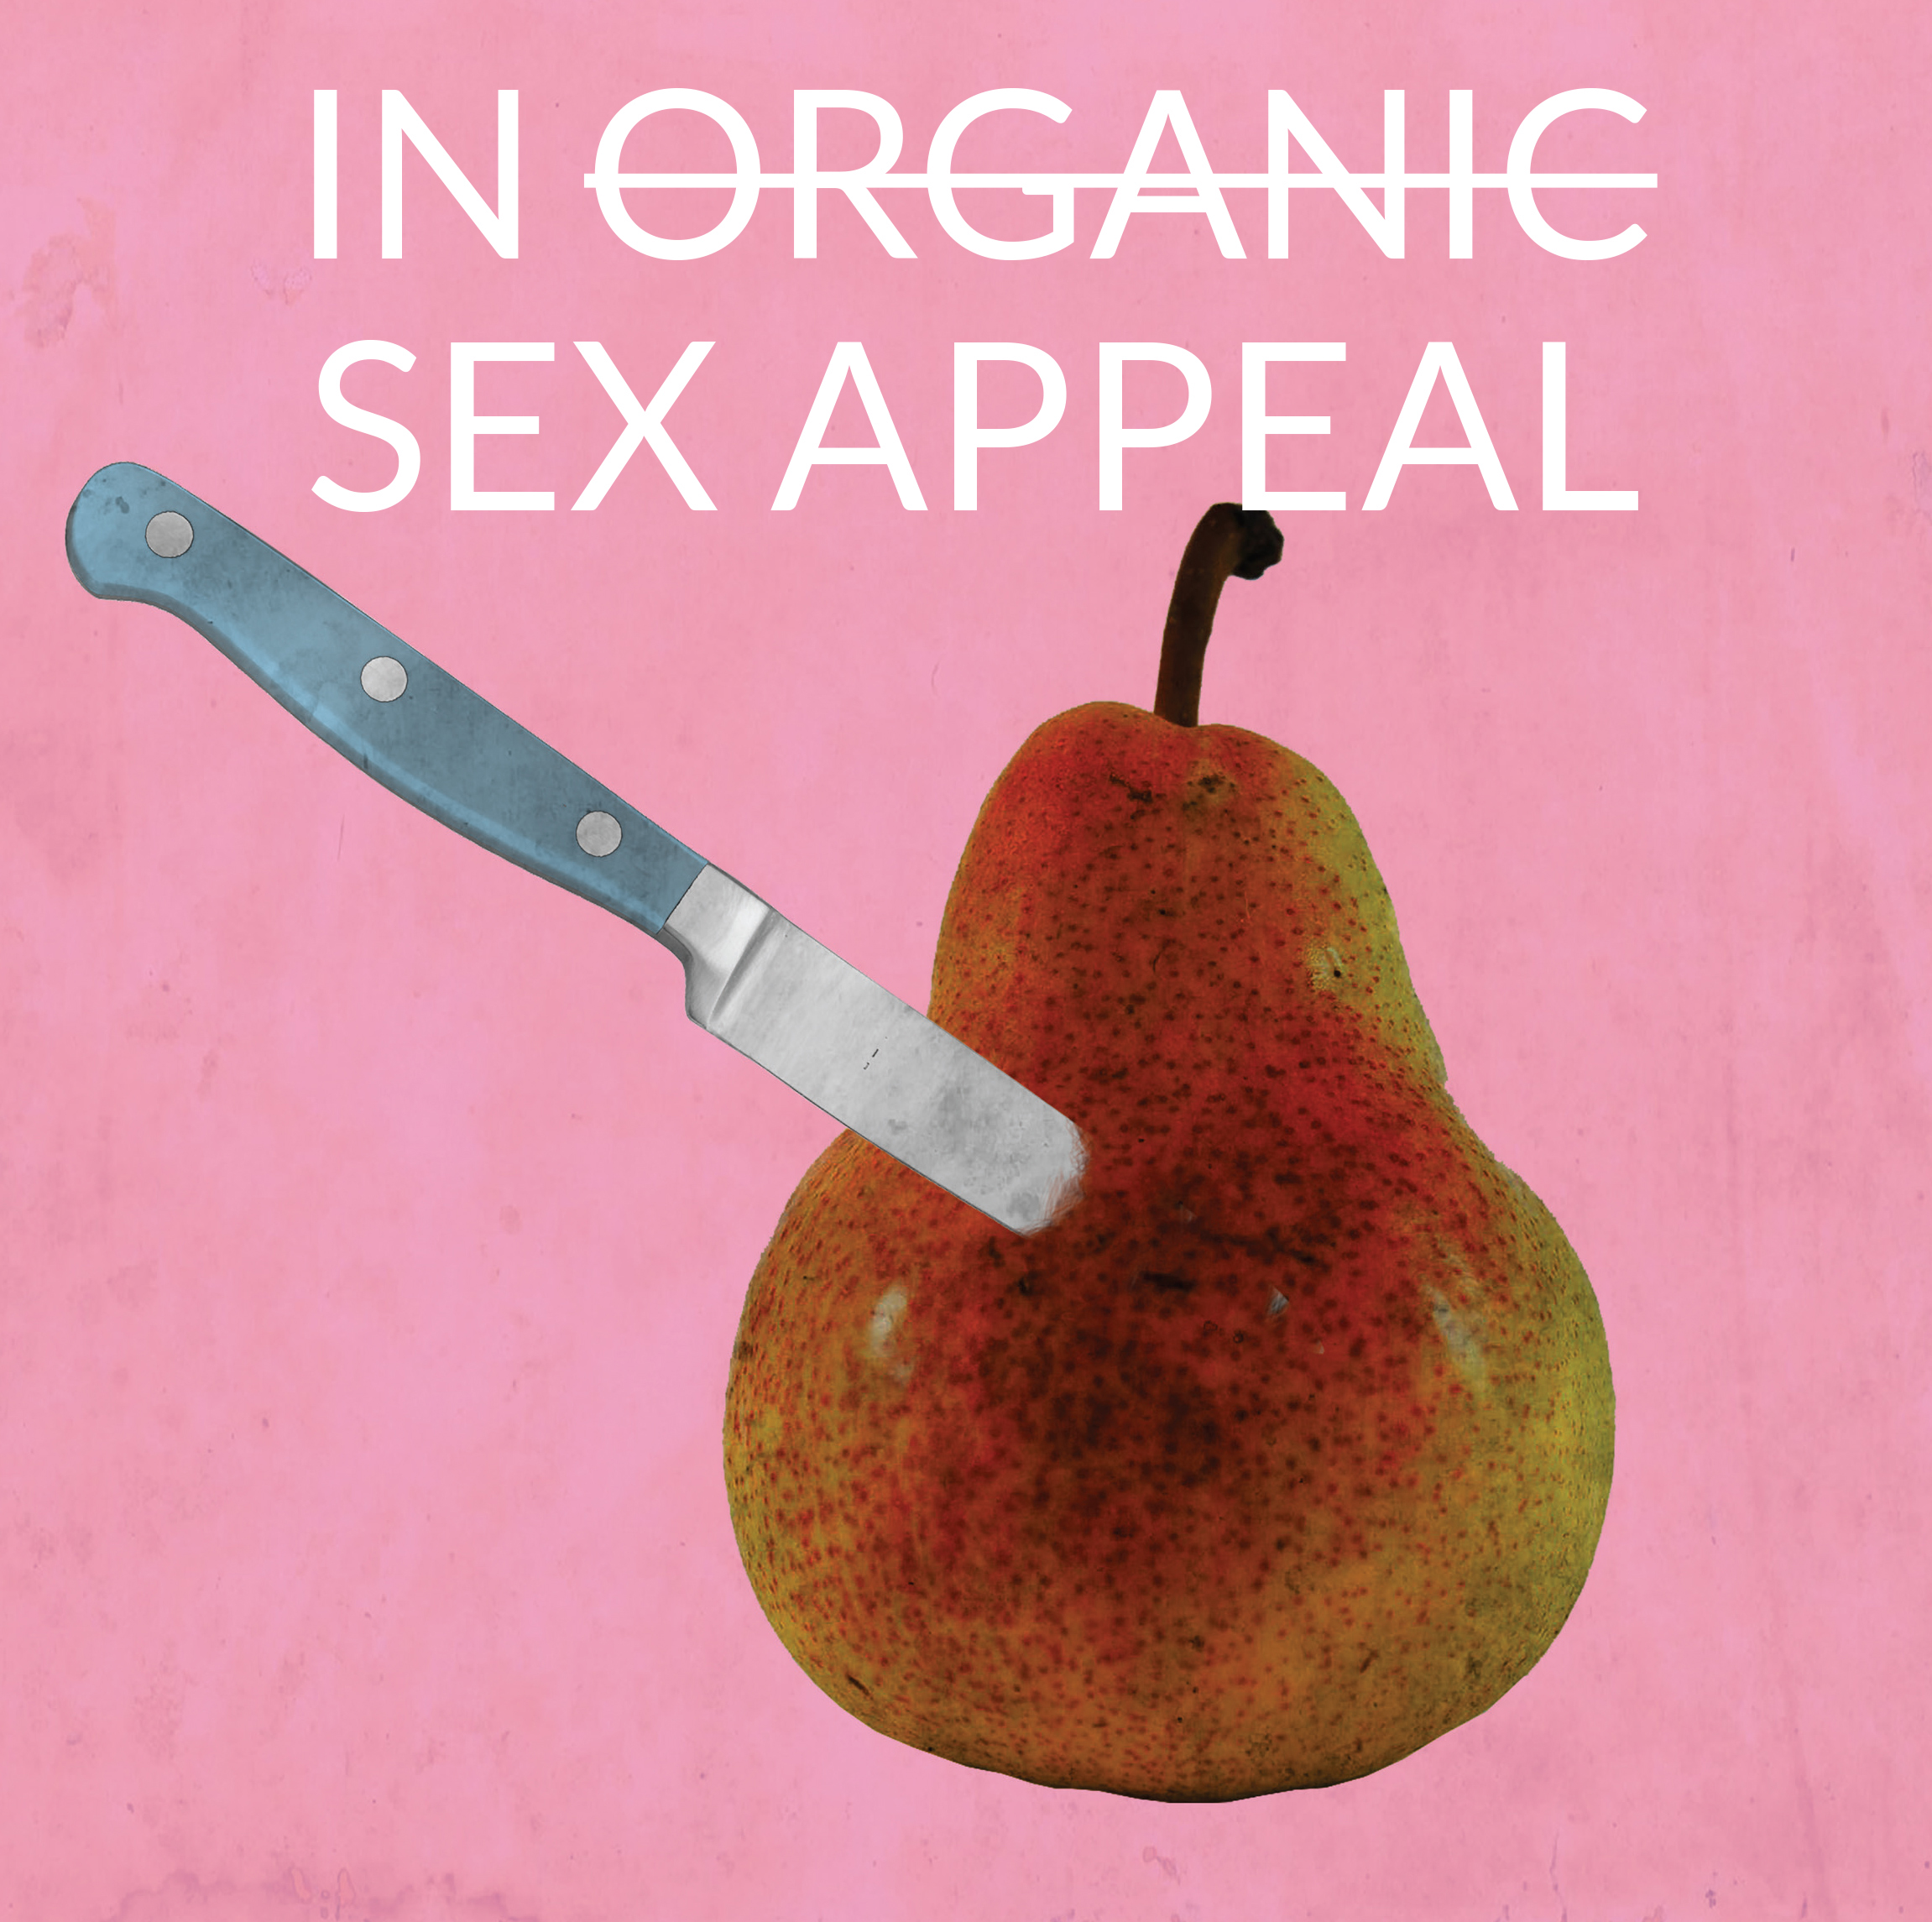 IN ORGANIC SEX APPEAL